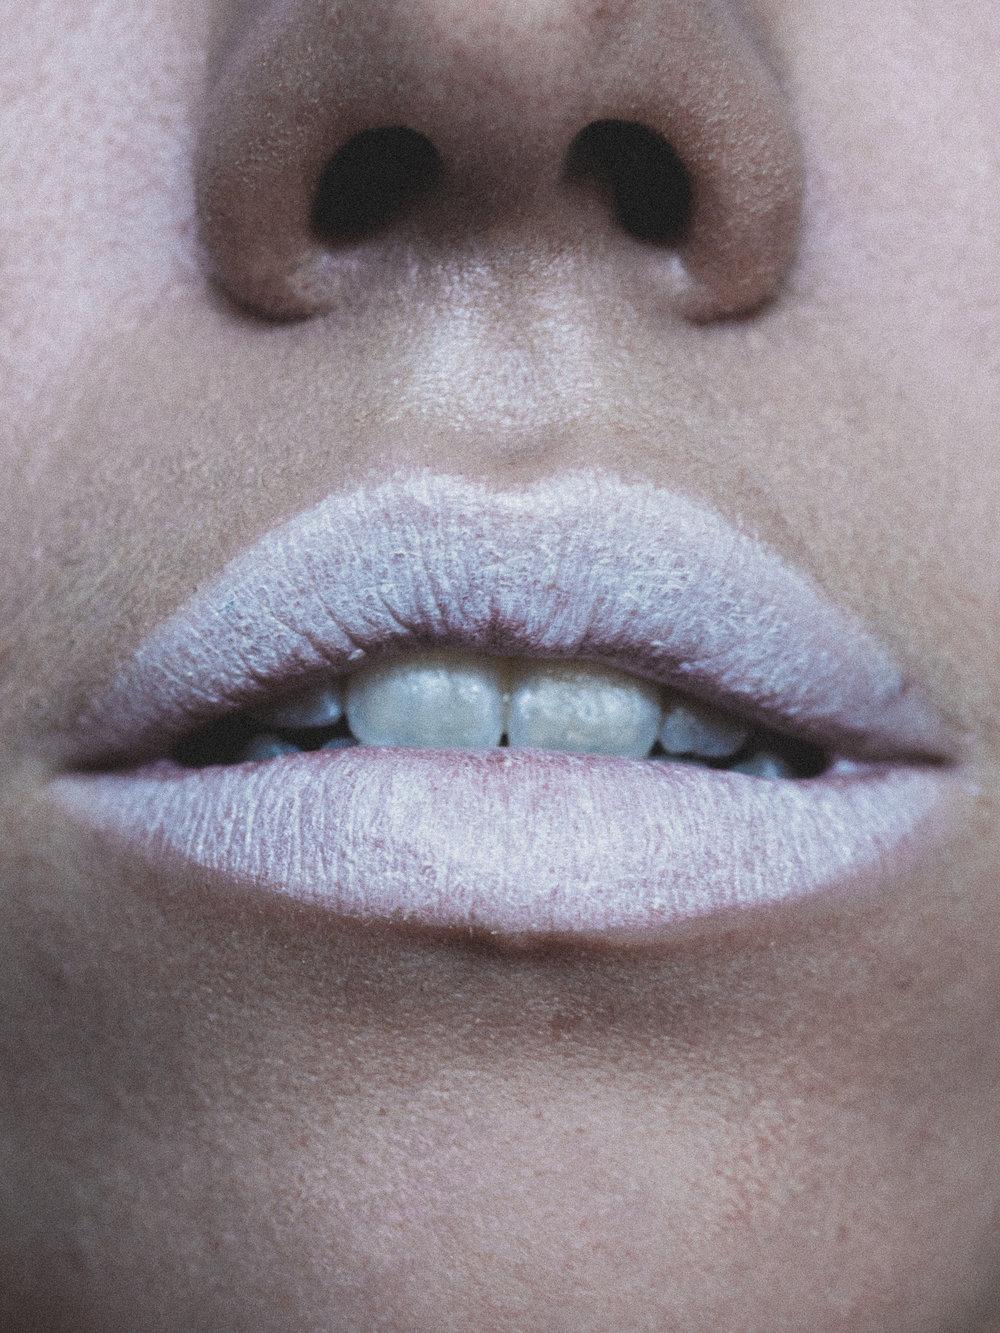 Lips: AiNSEL Lipstick in  Slip Dress  | Highlight: Nui Cosmetics  Natural Illusion Cream in Hukarere